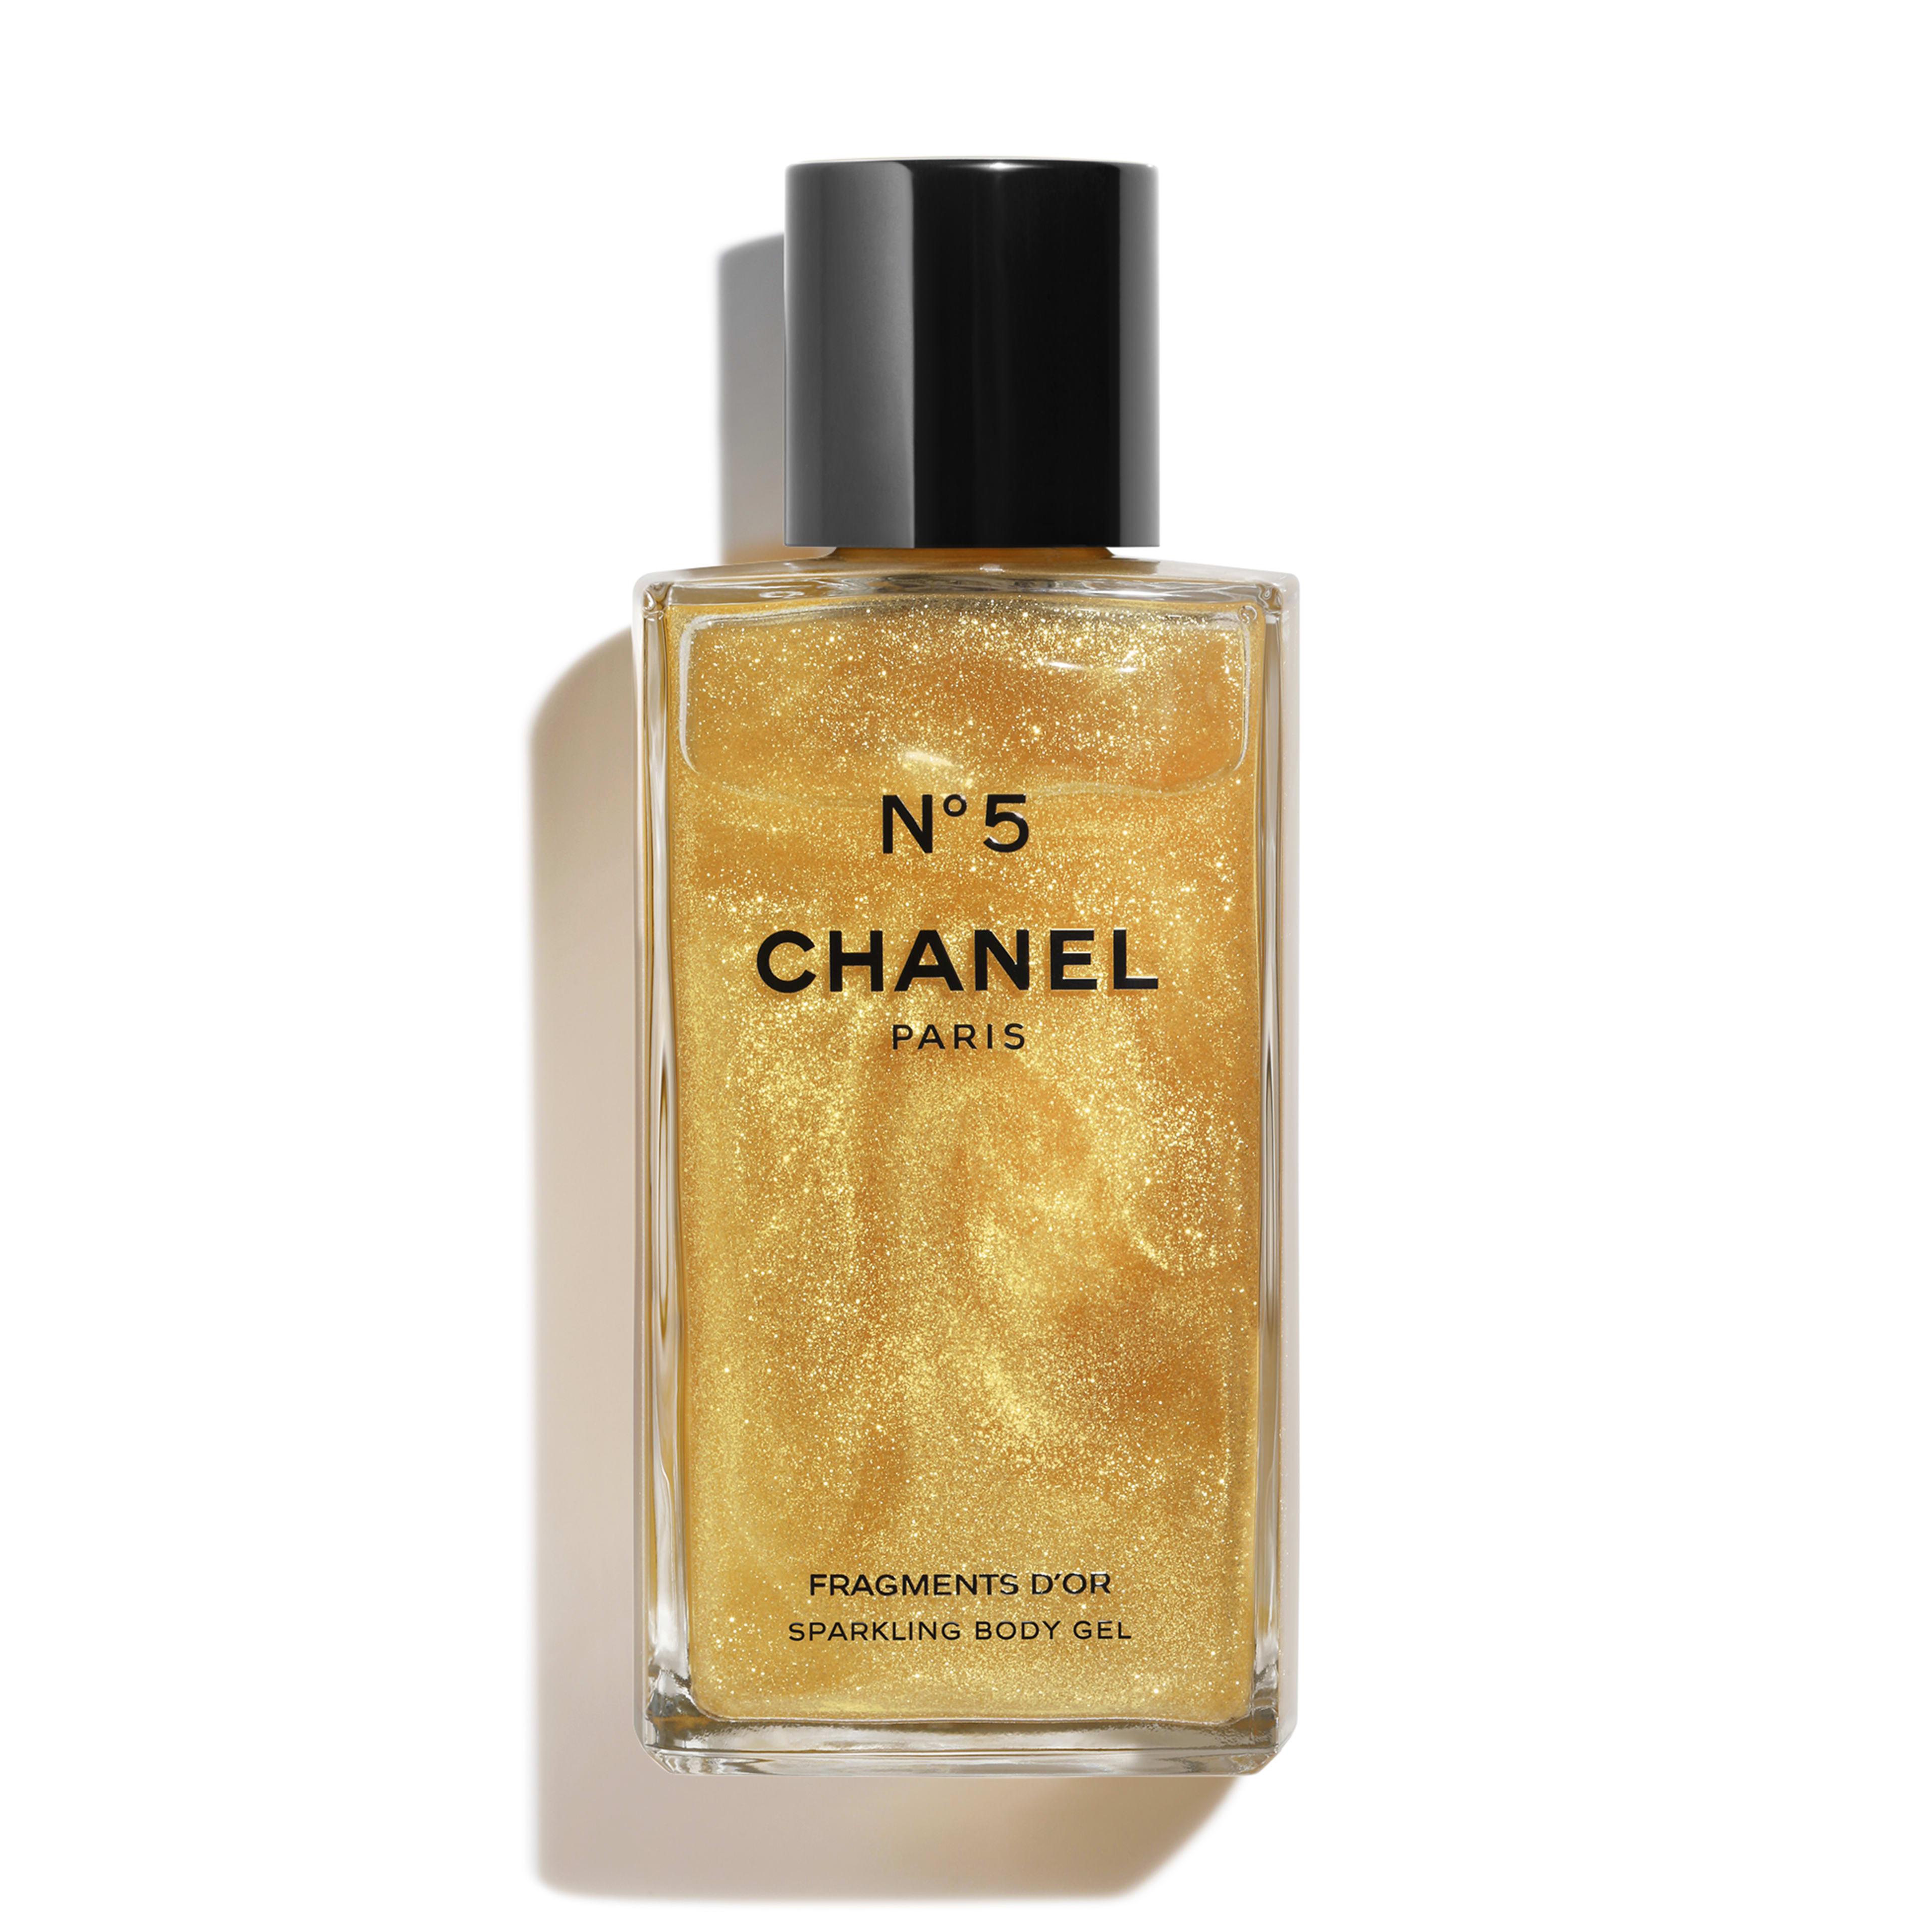 N°5 - fragrance - 250ml - มุมมองปัจจุบัน